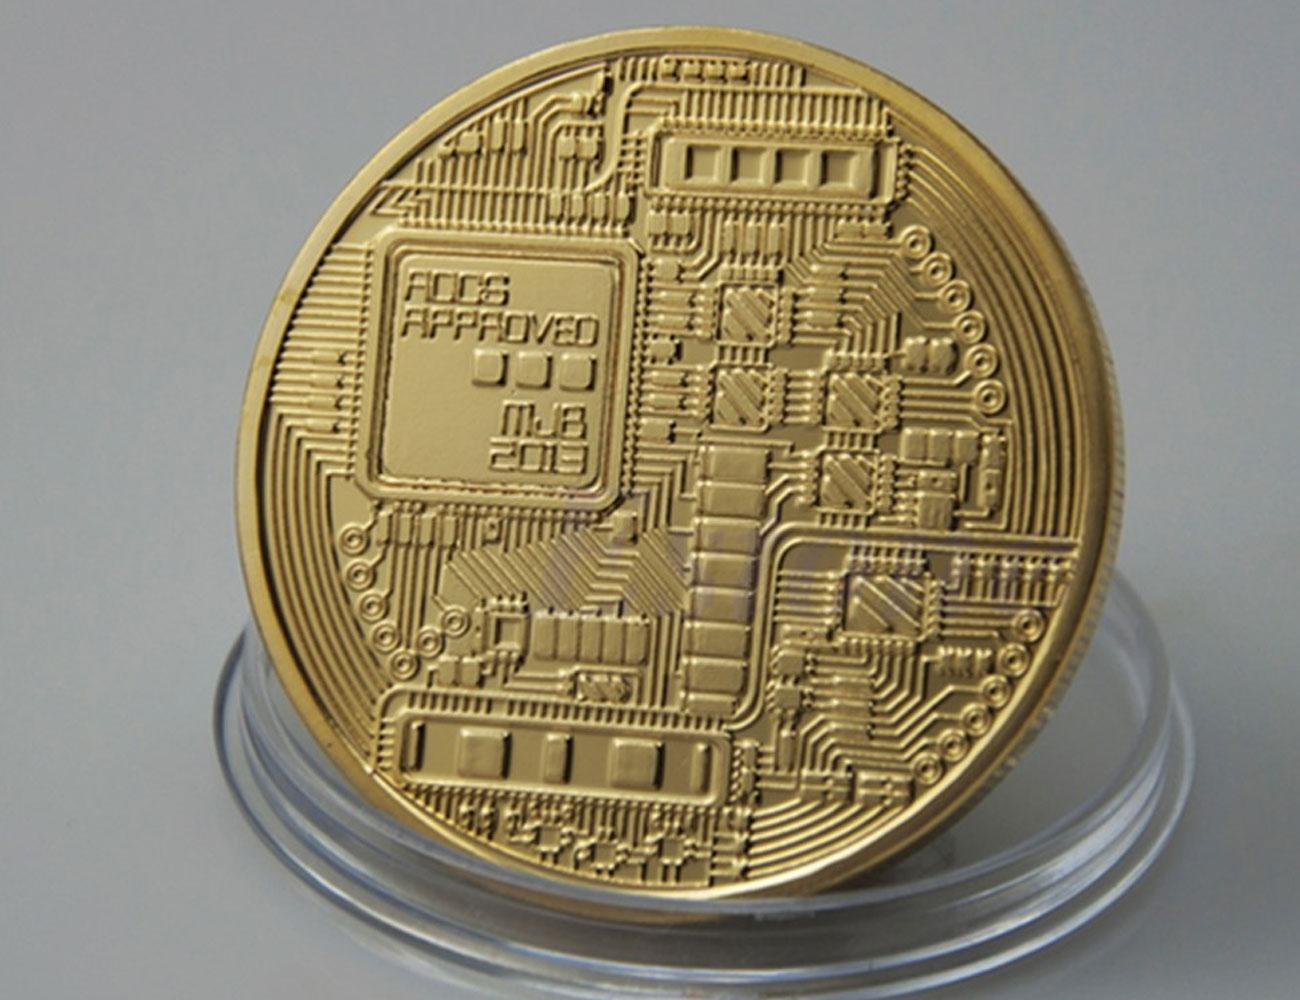 Сувенирная монета биткоин bitcoin срок за биткоин